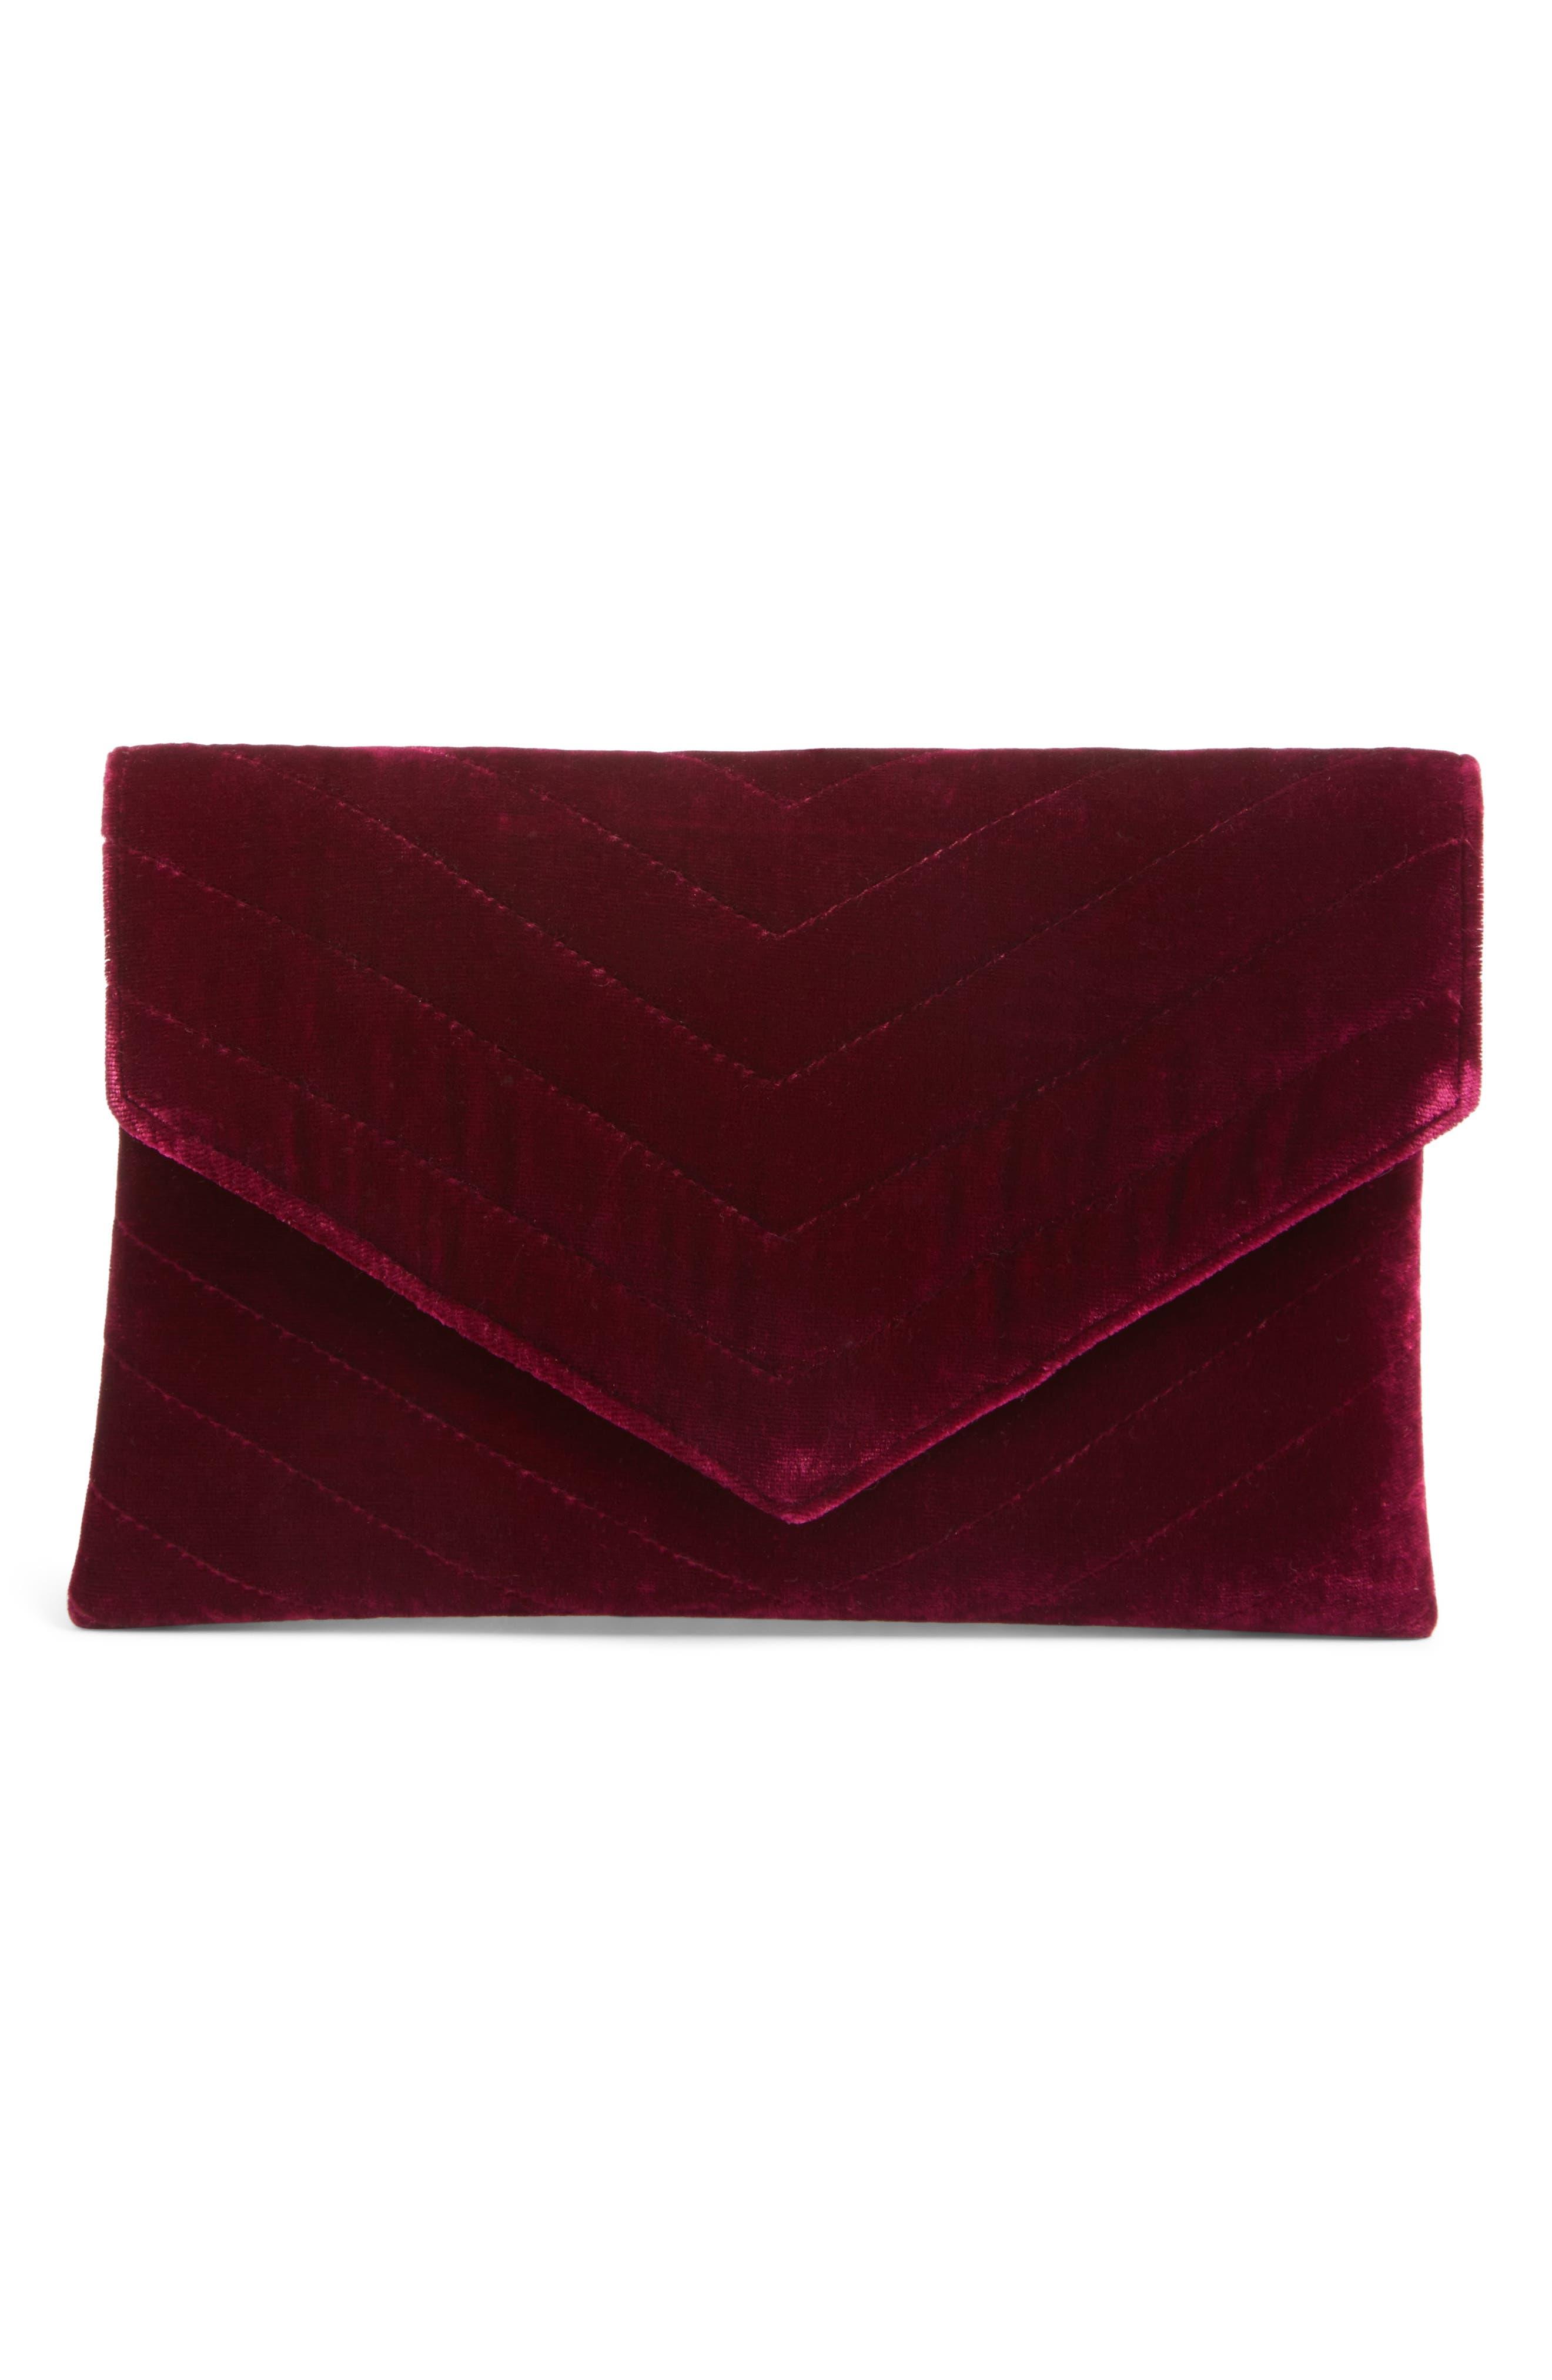 Alexis Velvet Envelope Clutch,                         Main,                         color, Magenta